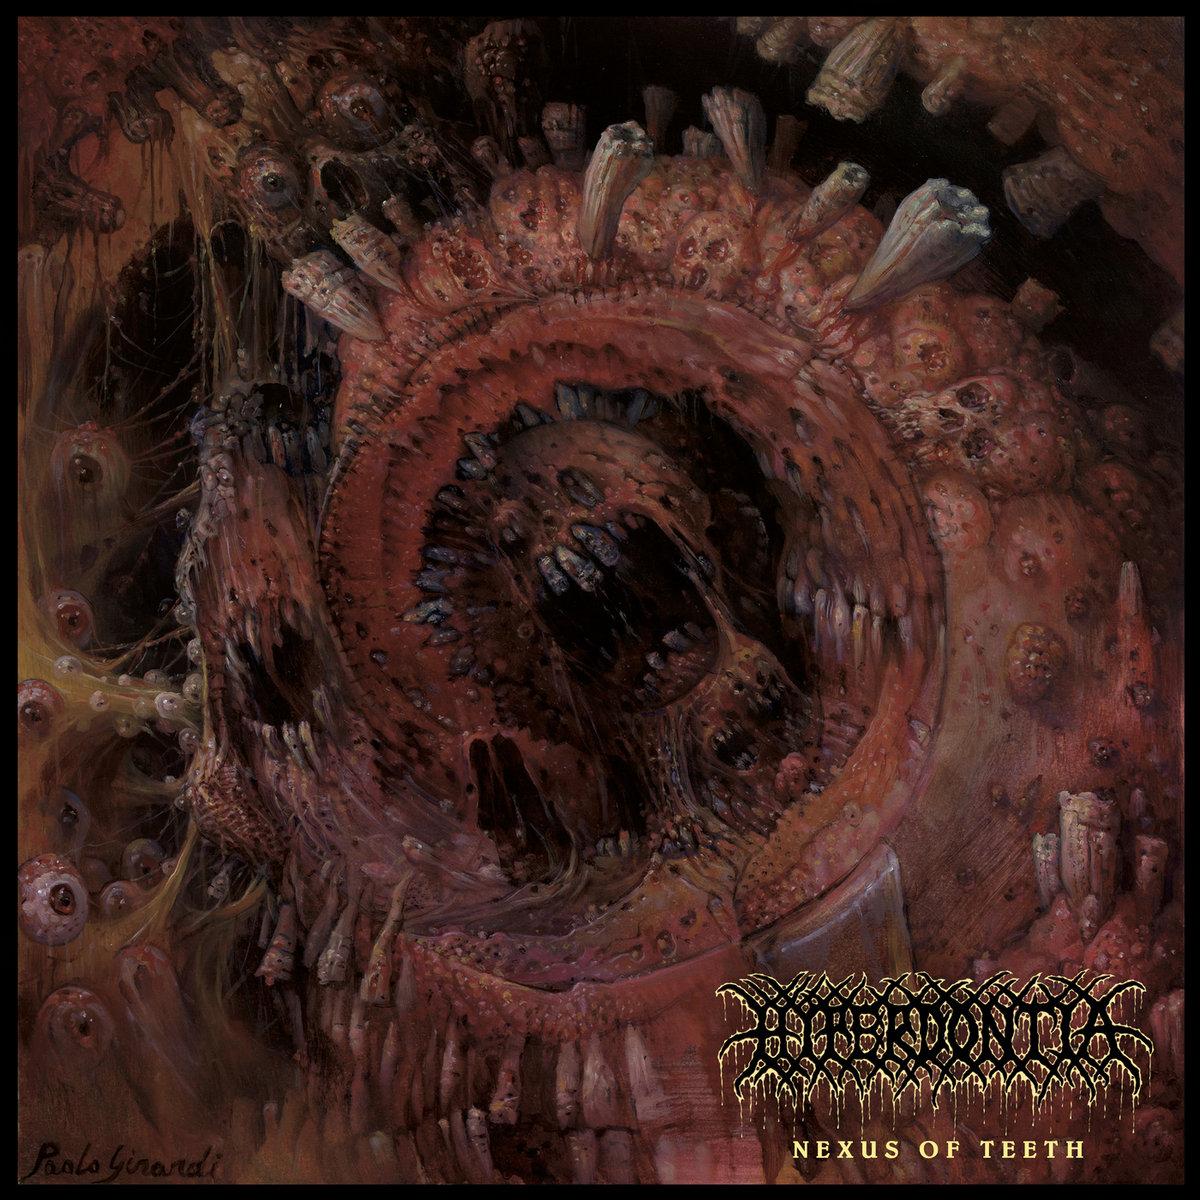 Hyperdontia - Nexus of Teeth